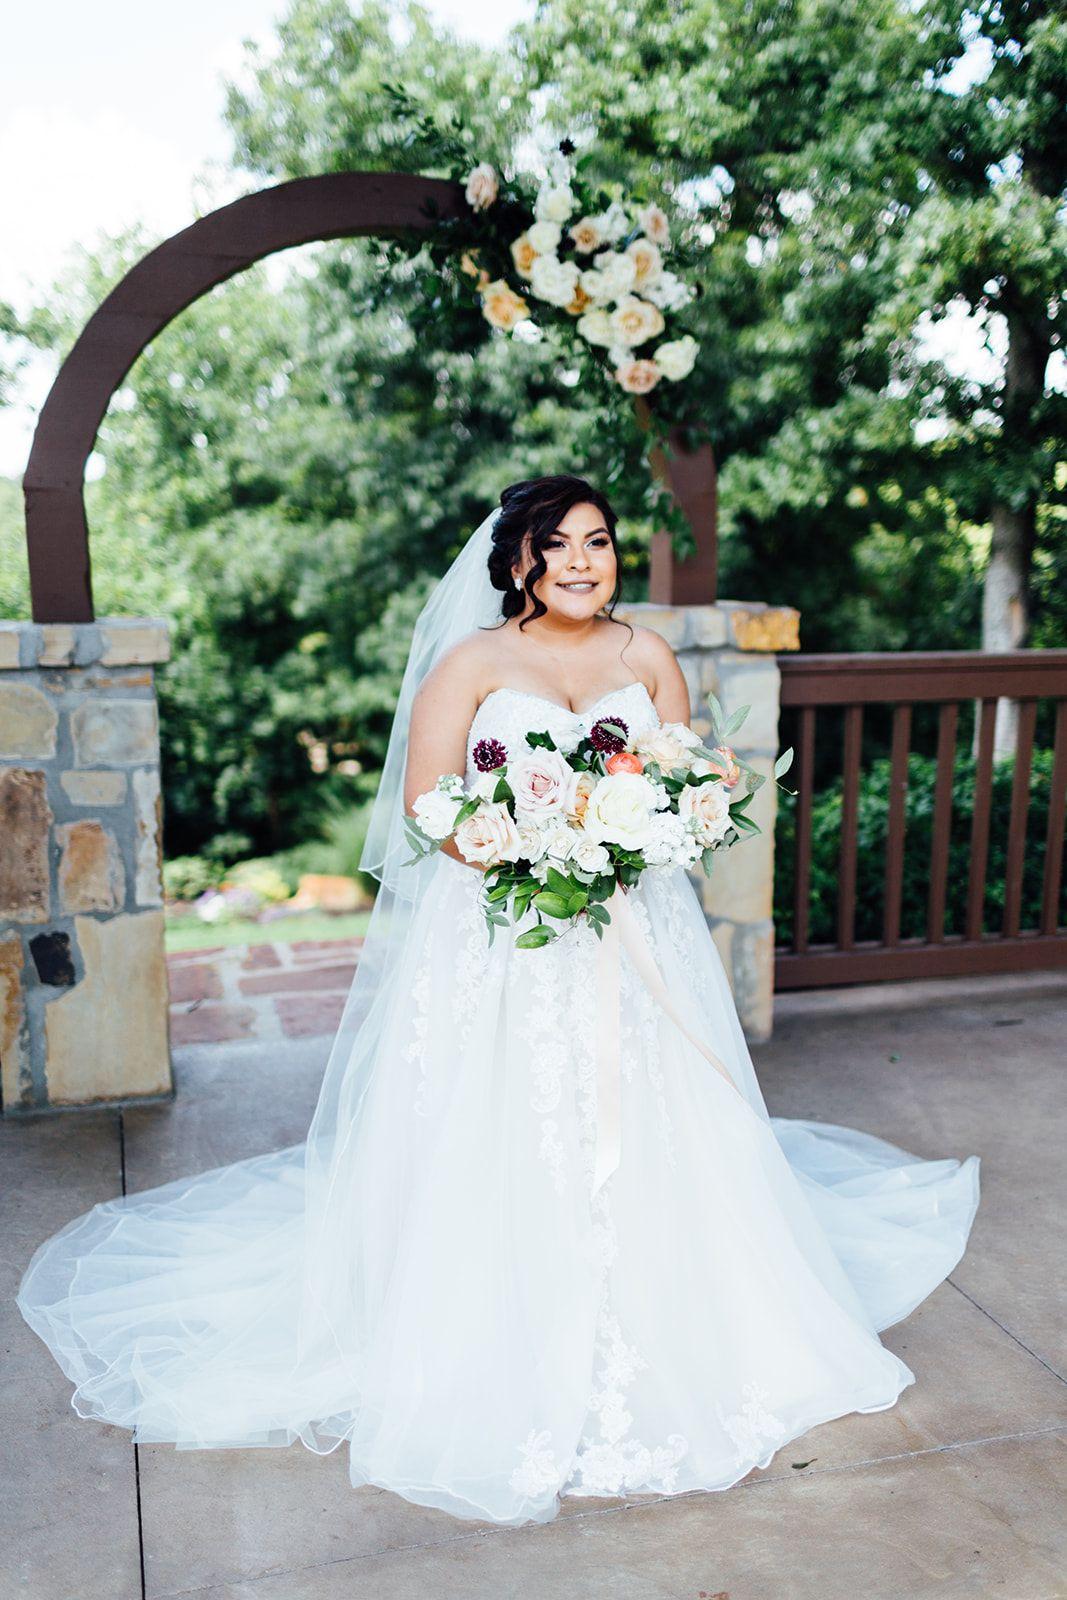 Outdoor summer wedding dresses  sleeveless wedding dress  summer wedding dress  tulle wedding gown